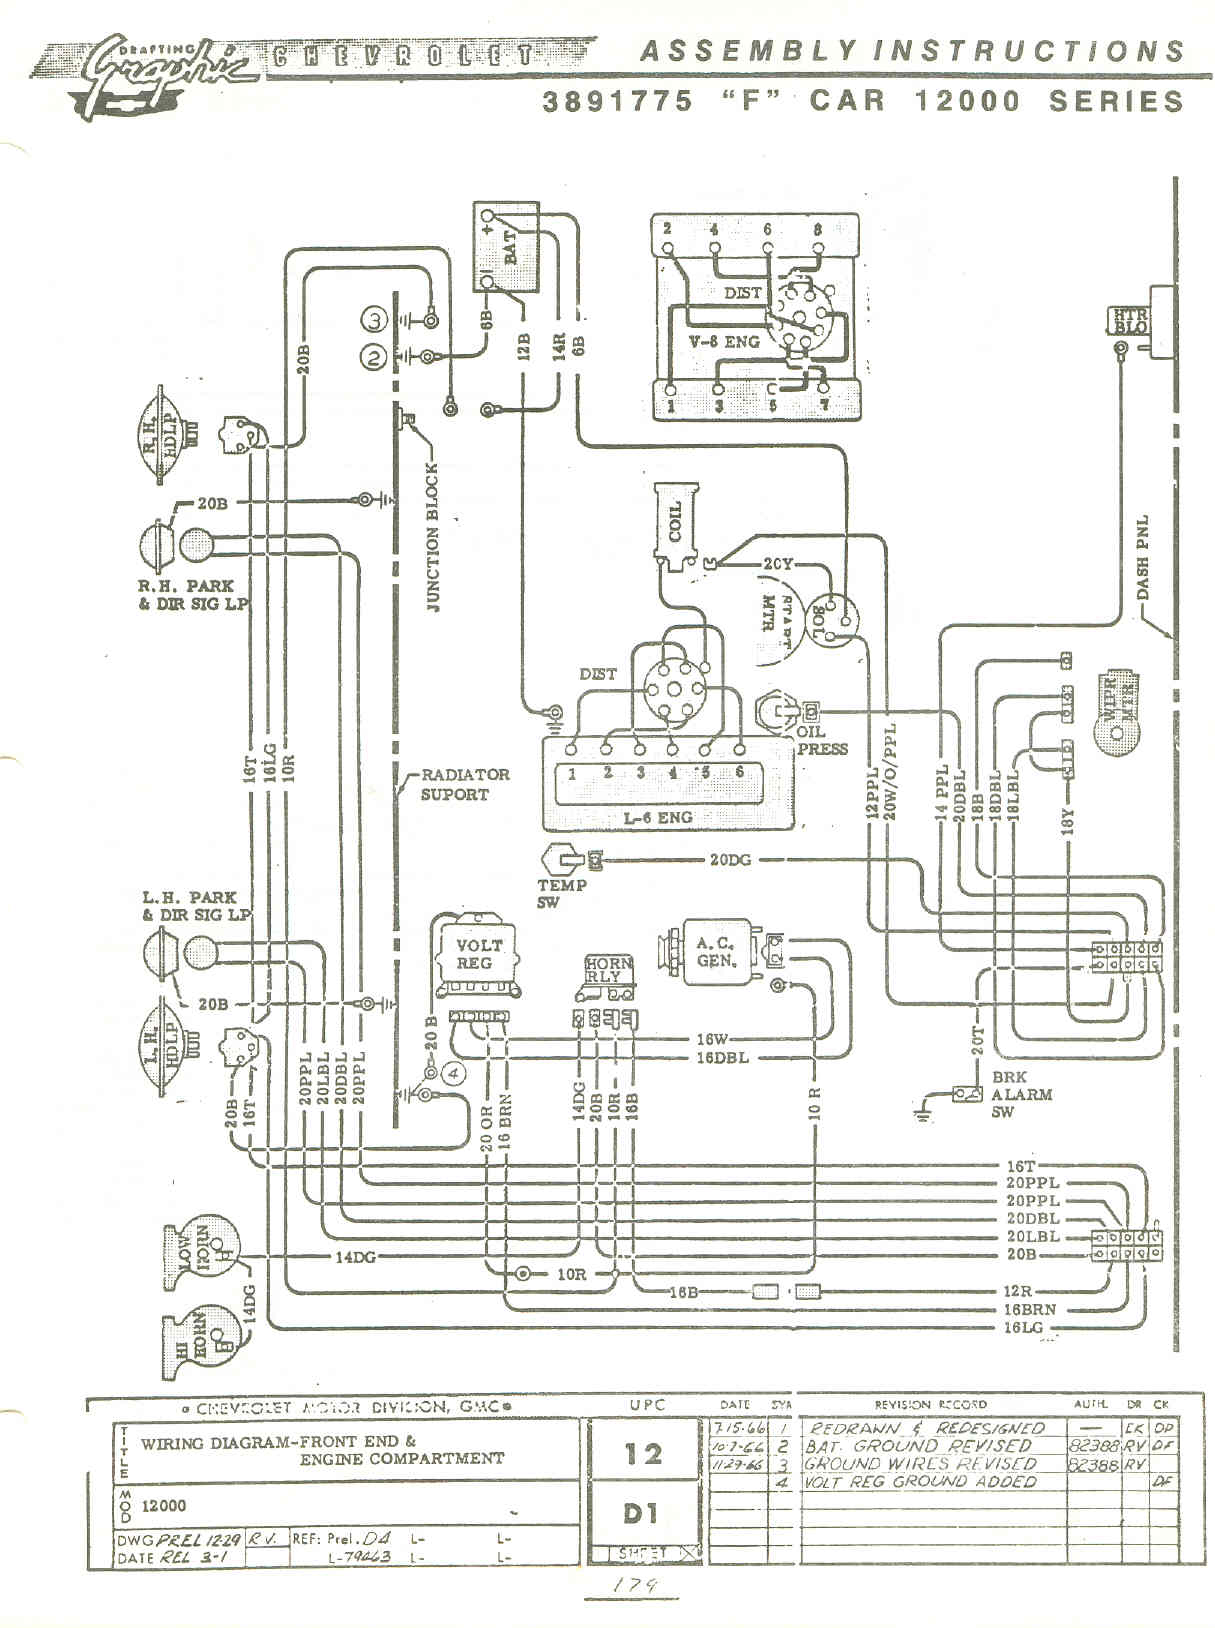 1968 camaro engine wiring harness diagram 1968 1968 camaro wiring harness 1968 image wiring diagram on 1968 camaro engine wiring harness